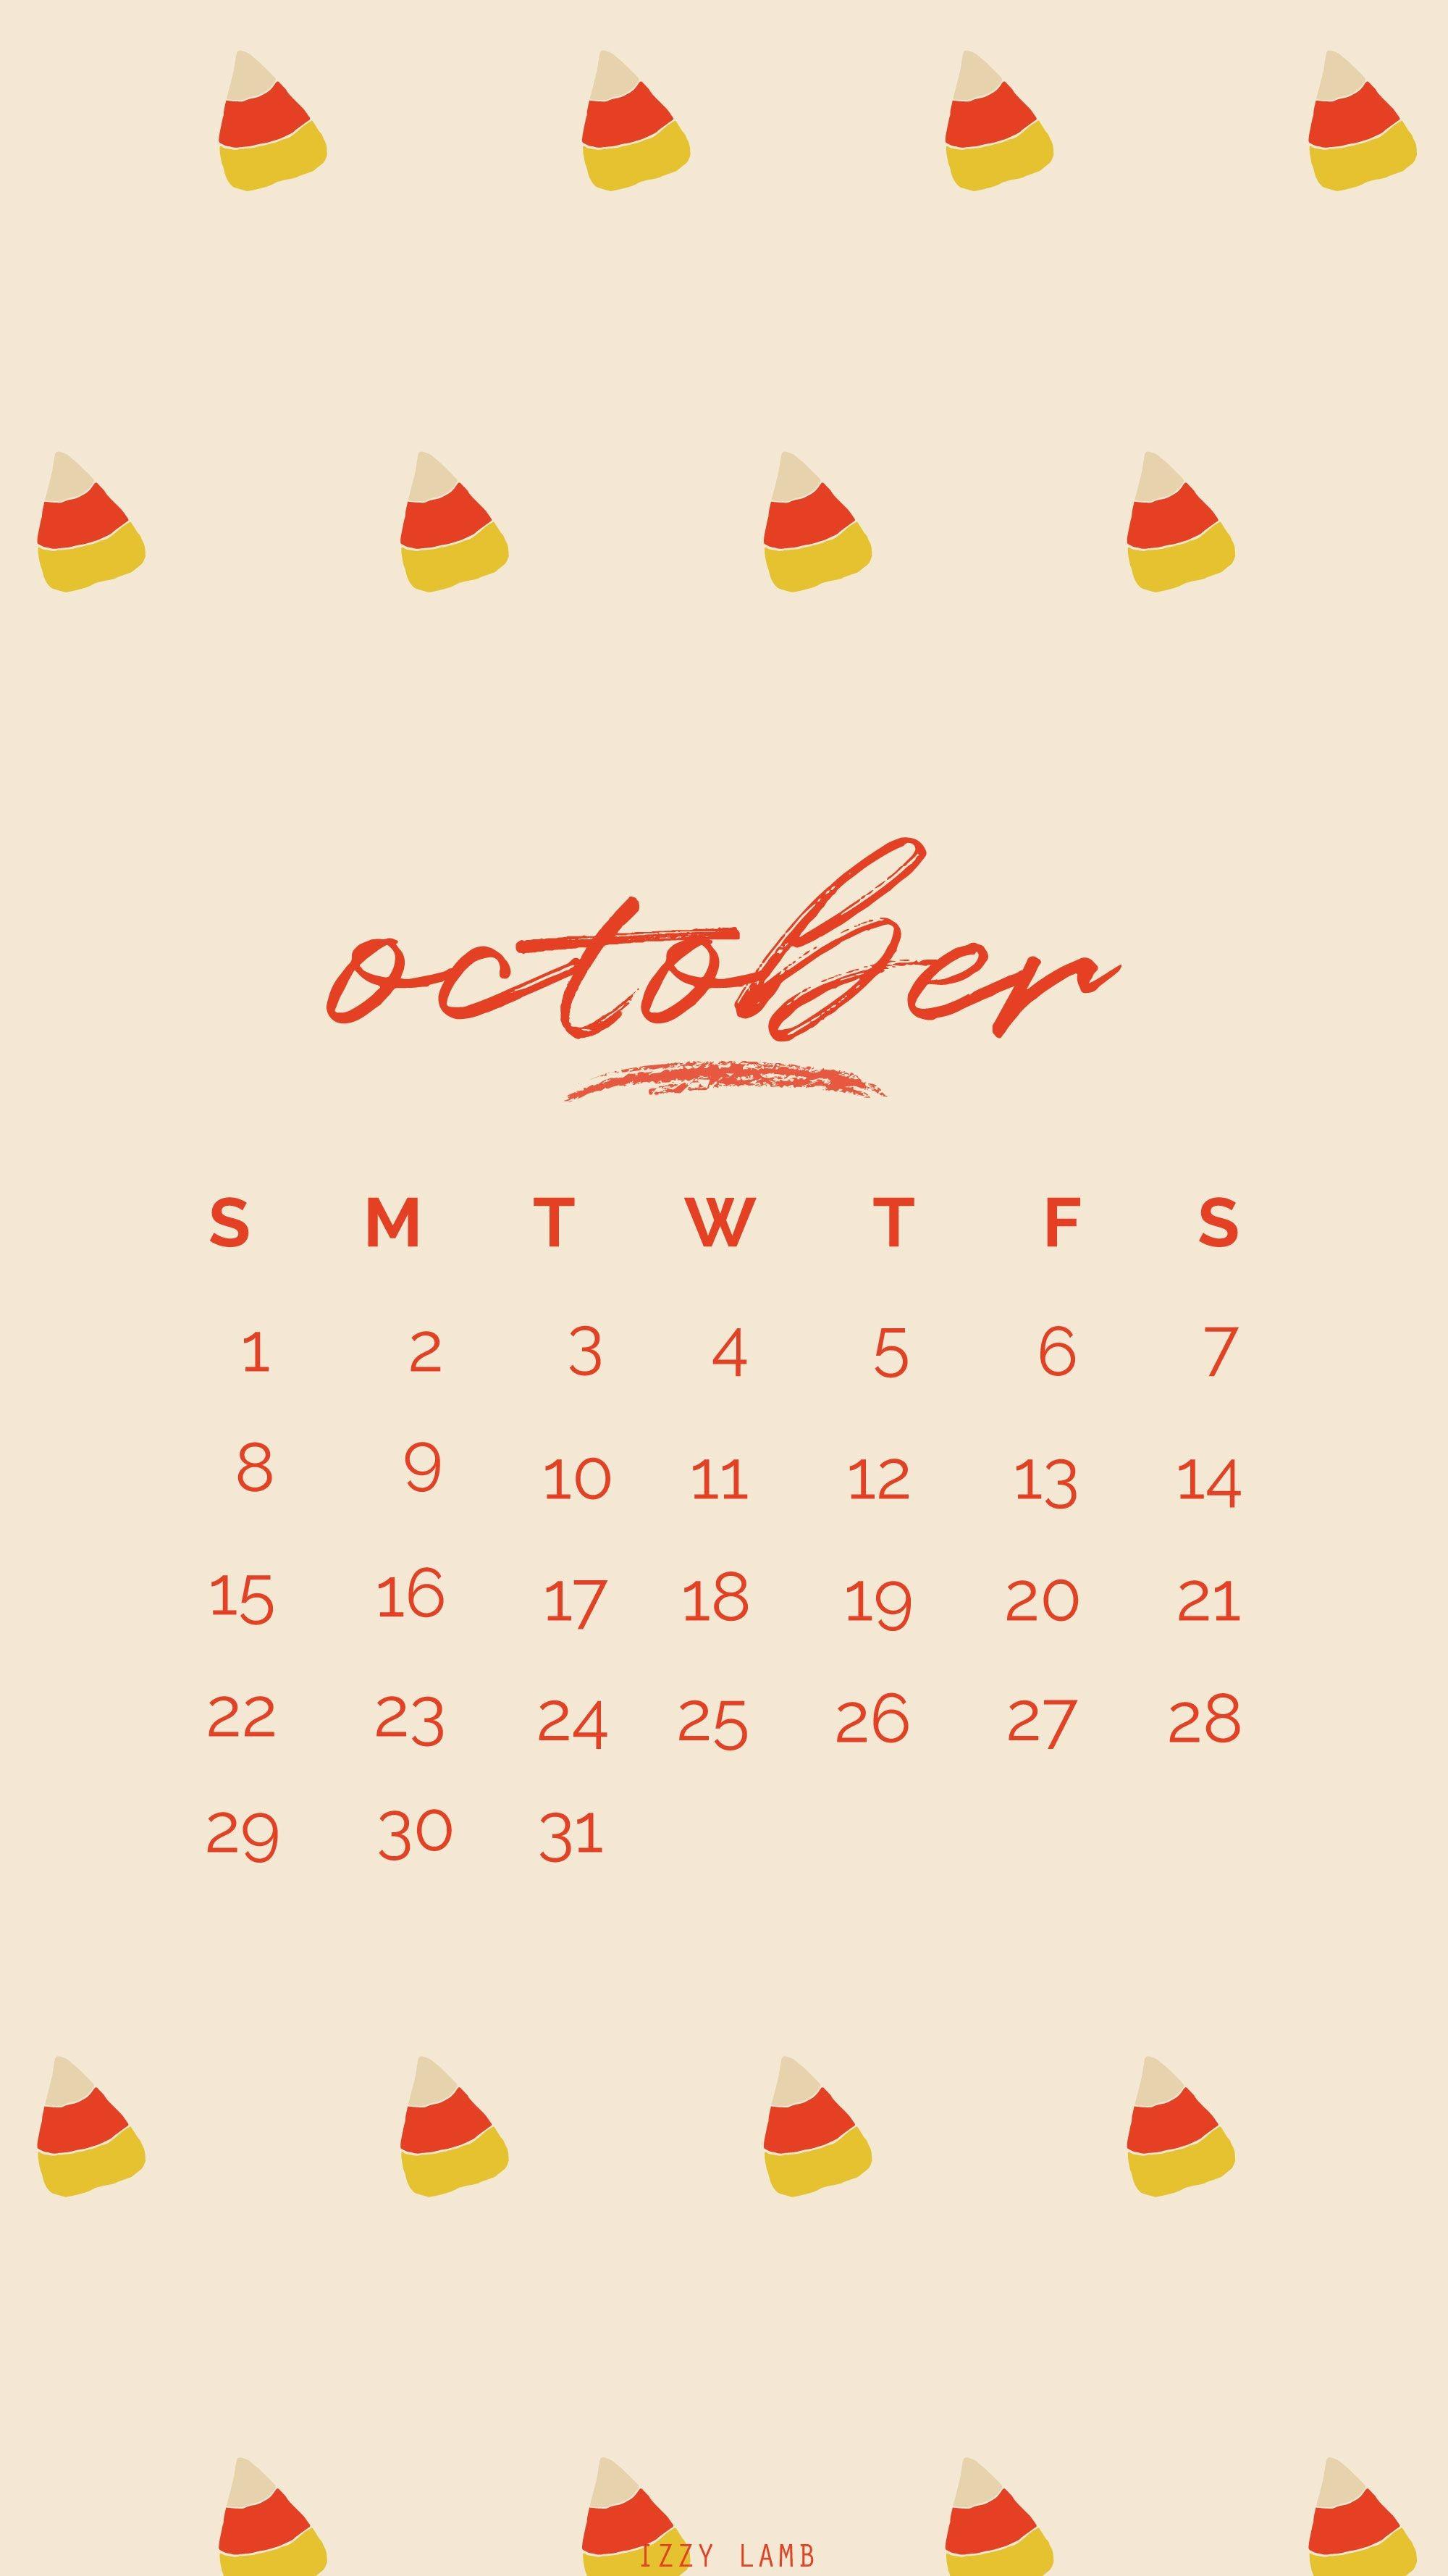 October Calender wallpaper iphone october octoberwallpaper iphonebackground background fall